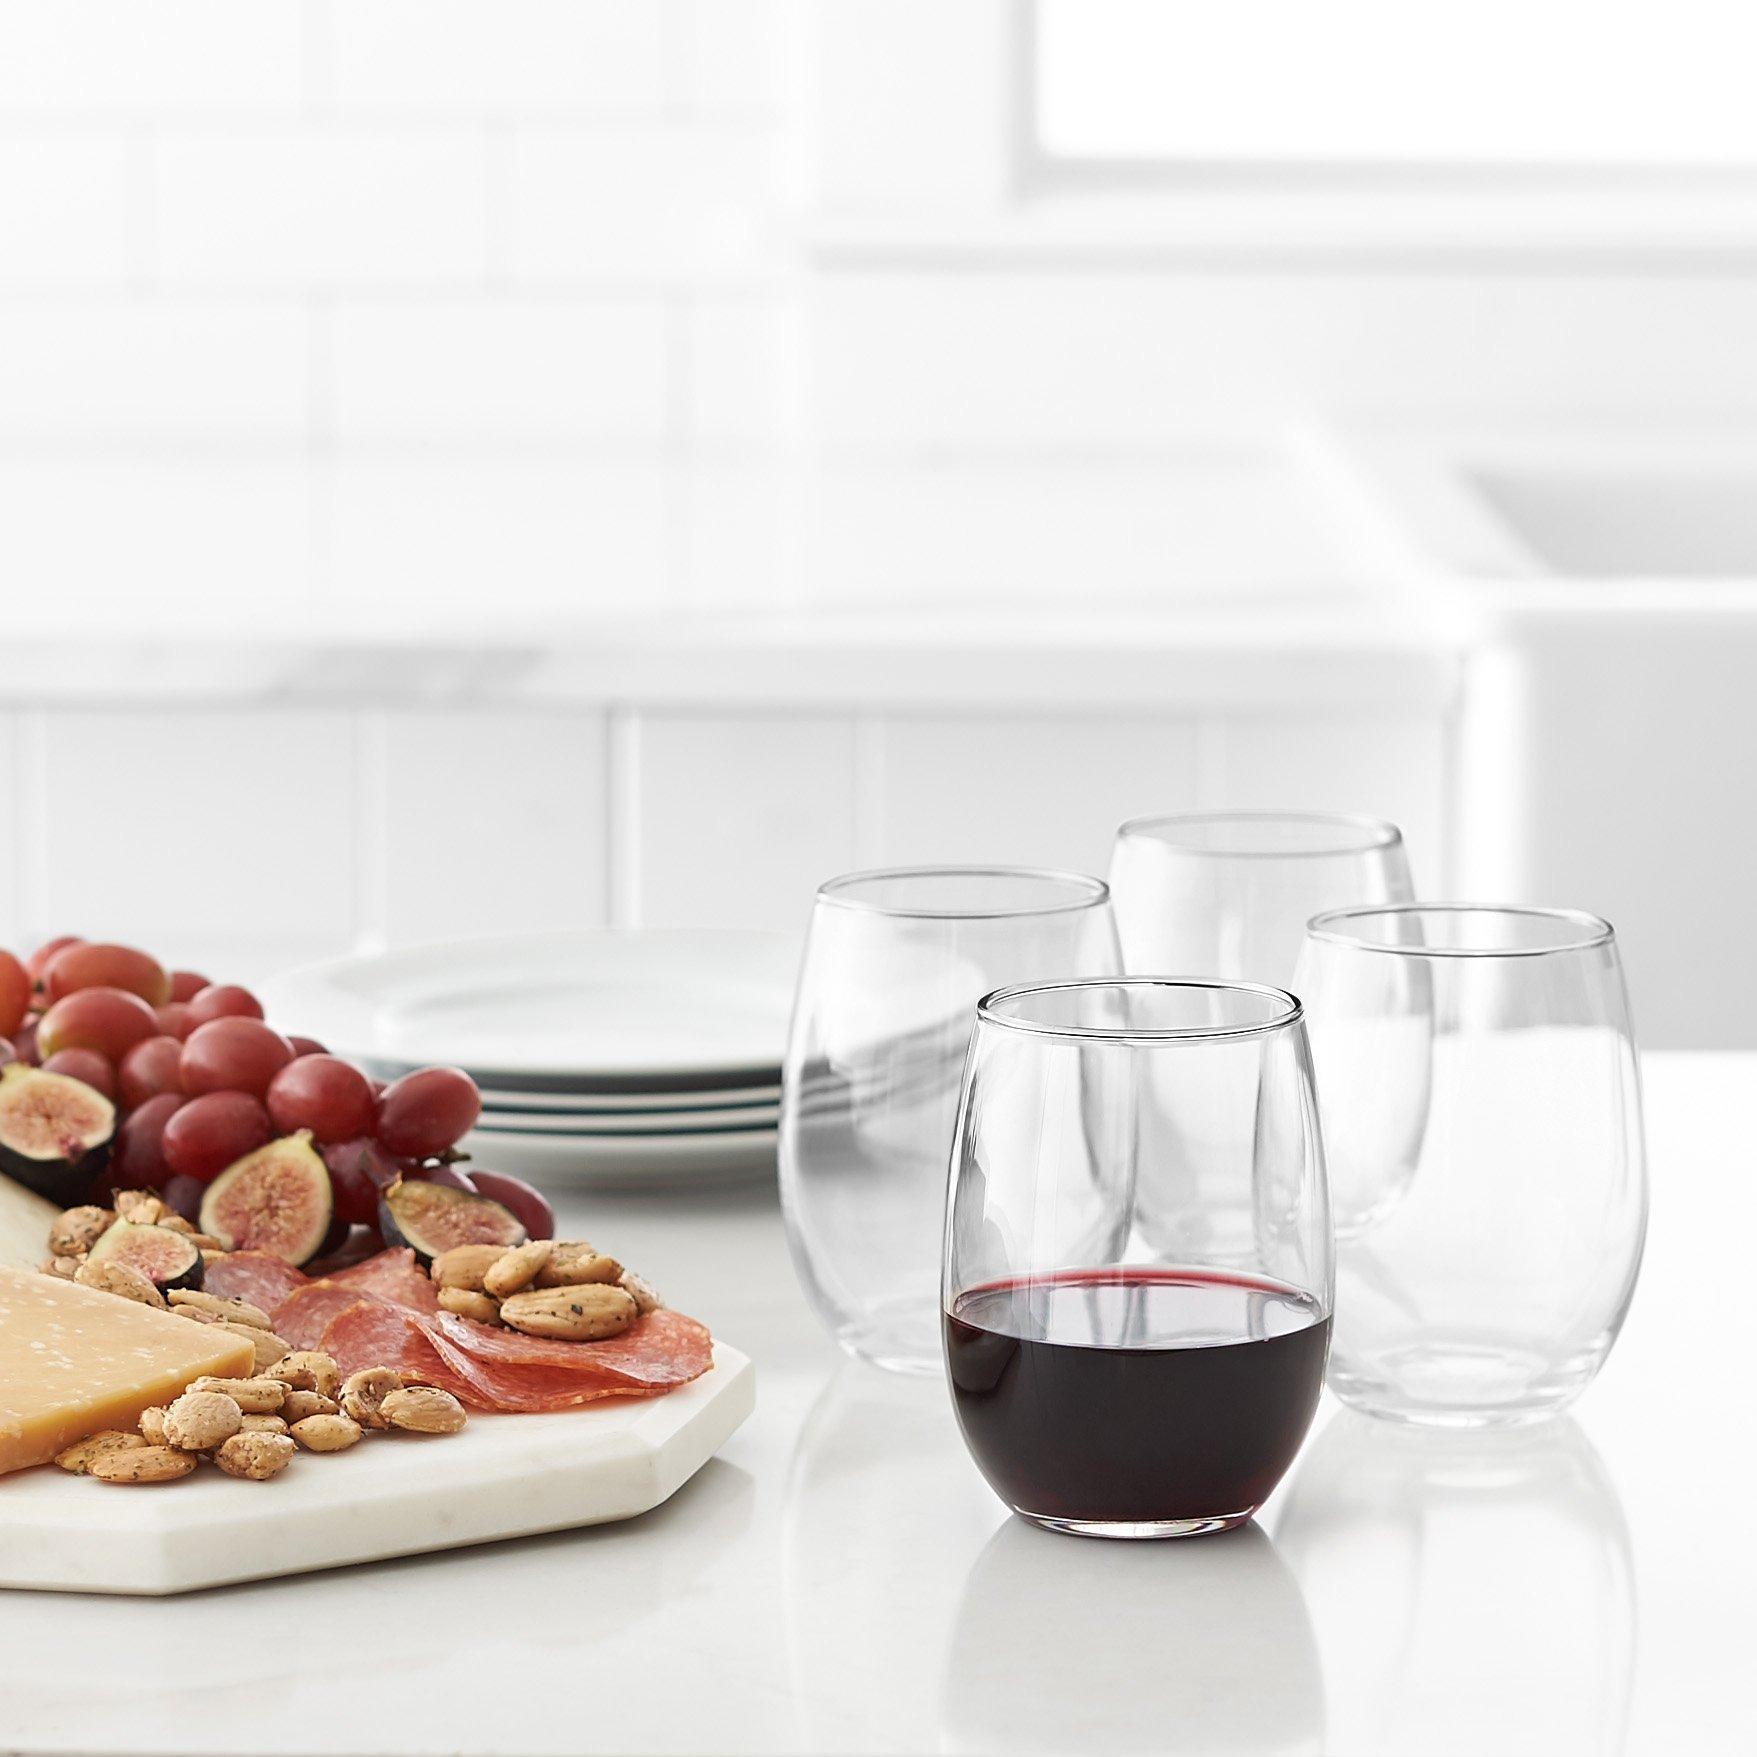 Amazon Basics Stemless Wine Glasses Set Of 4 15 Oz Wine Glasses